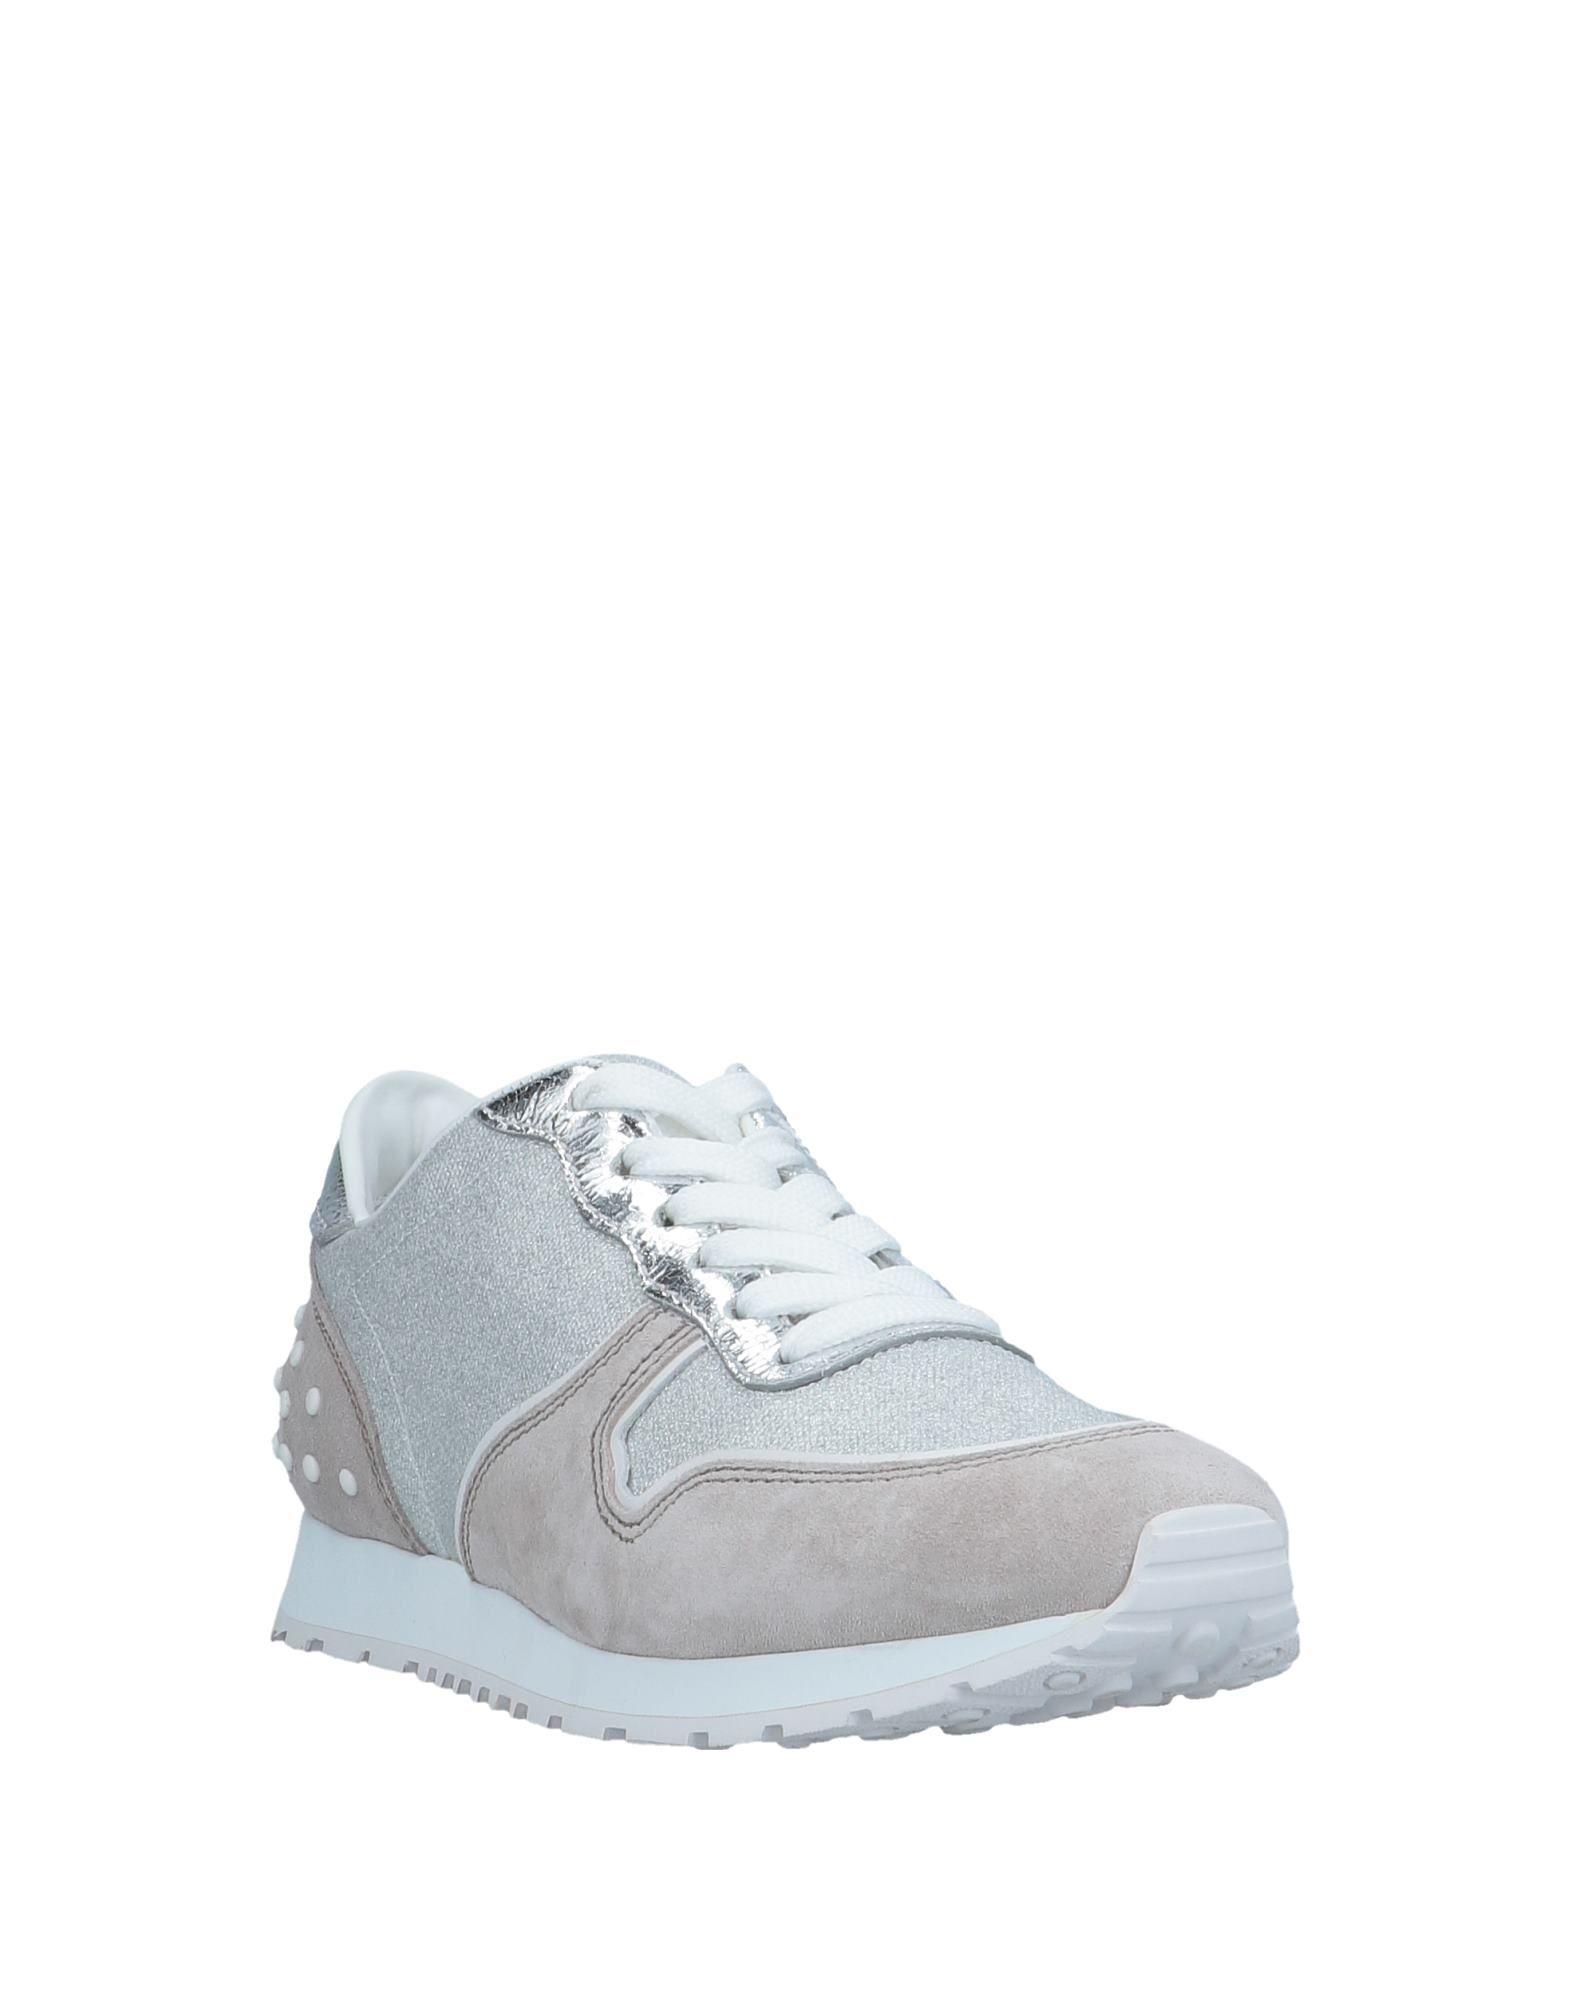 Rabatt Schuhe Tod's Damen Sneakers Damen Tod's  11565146OL 583f38